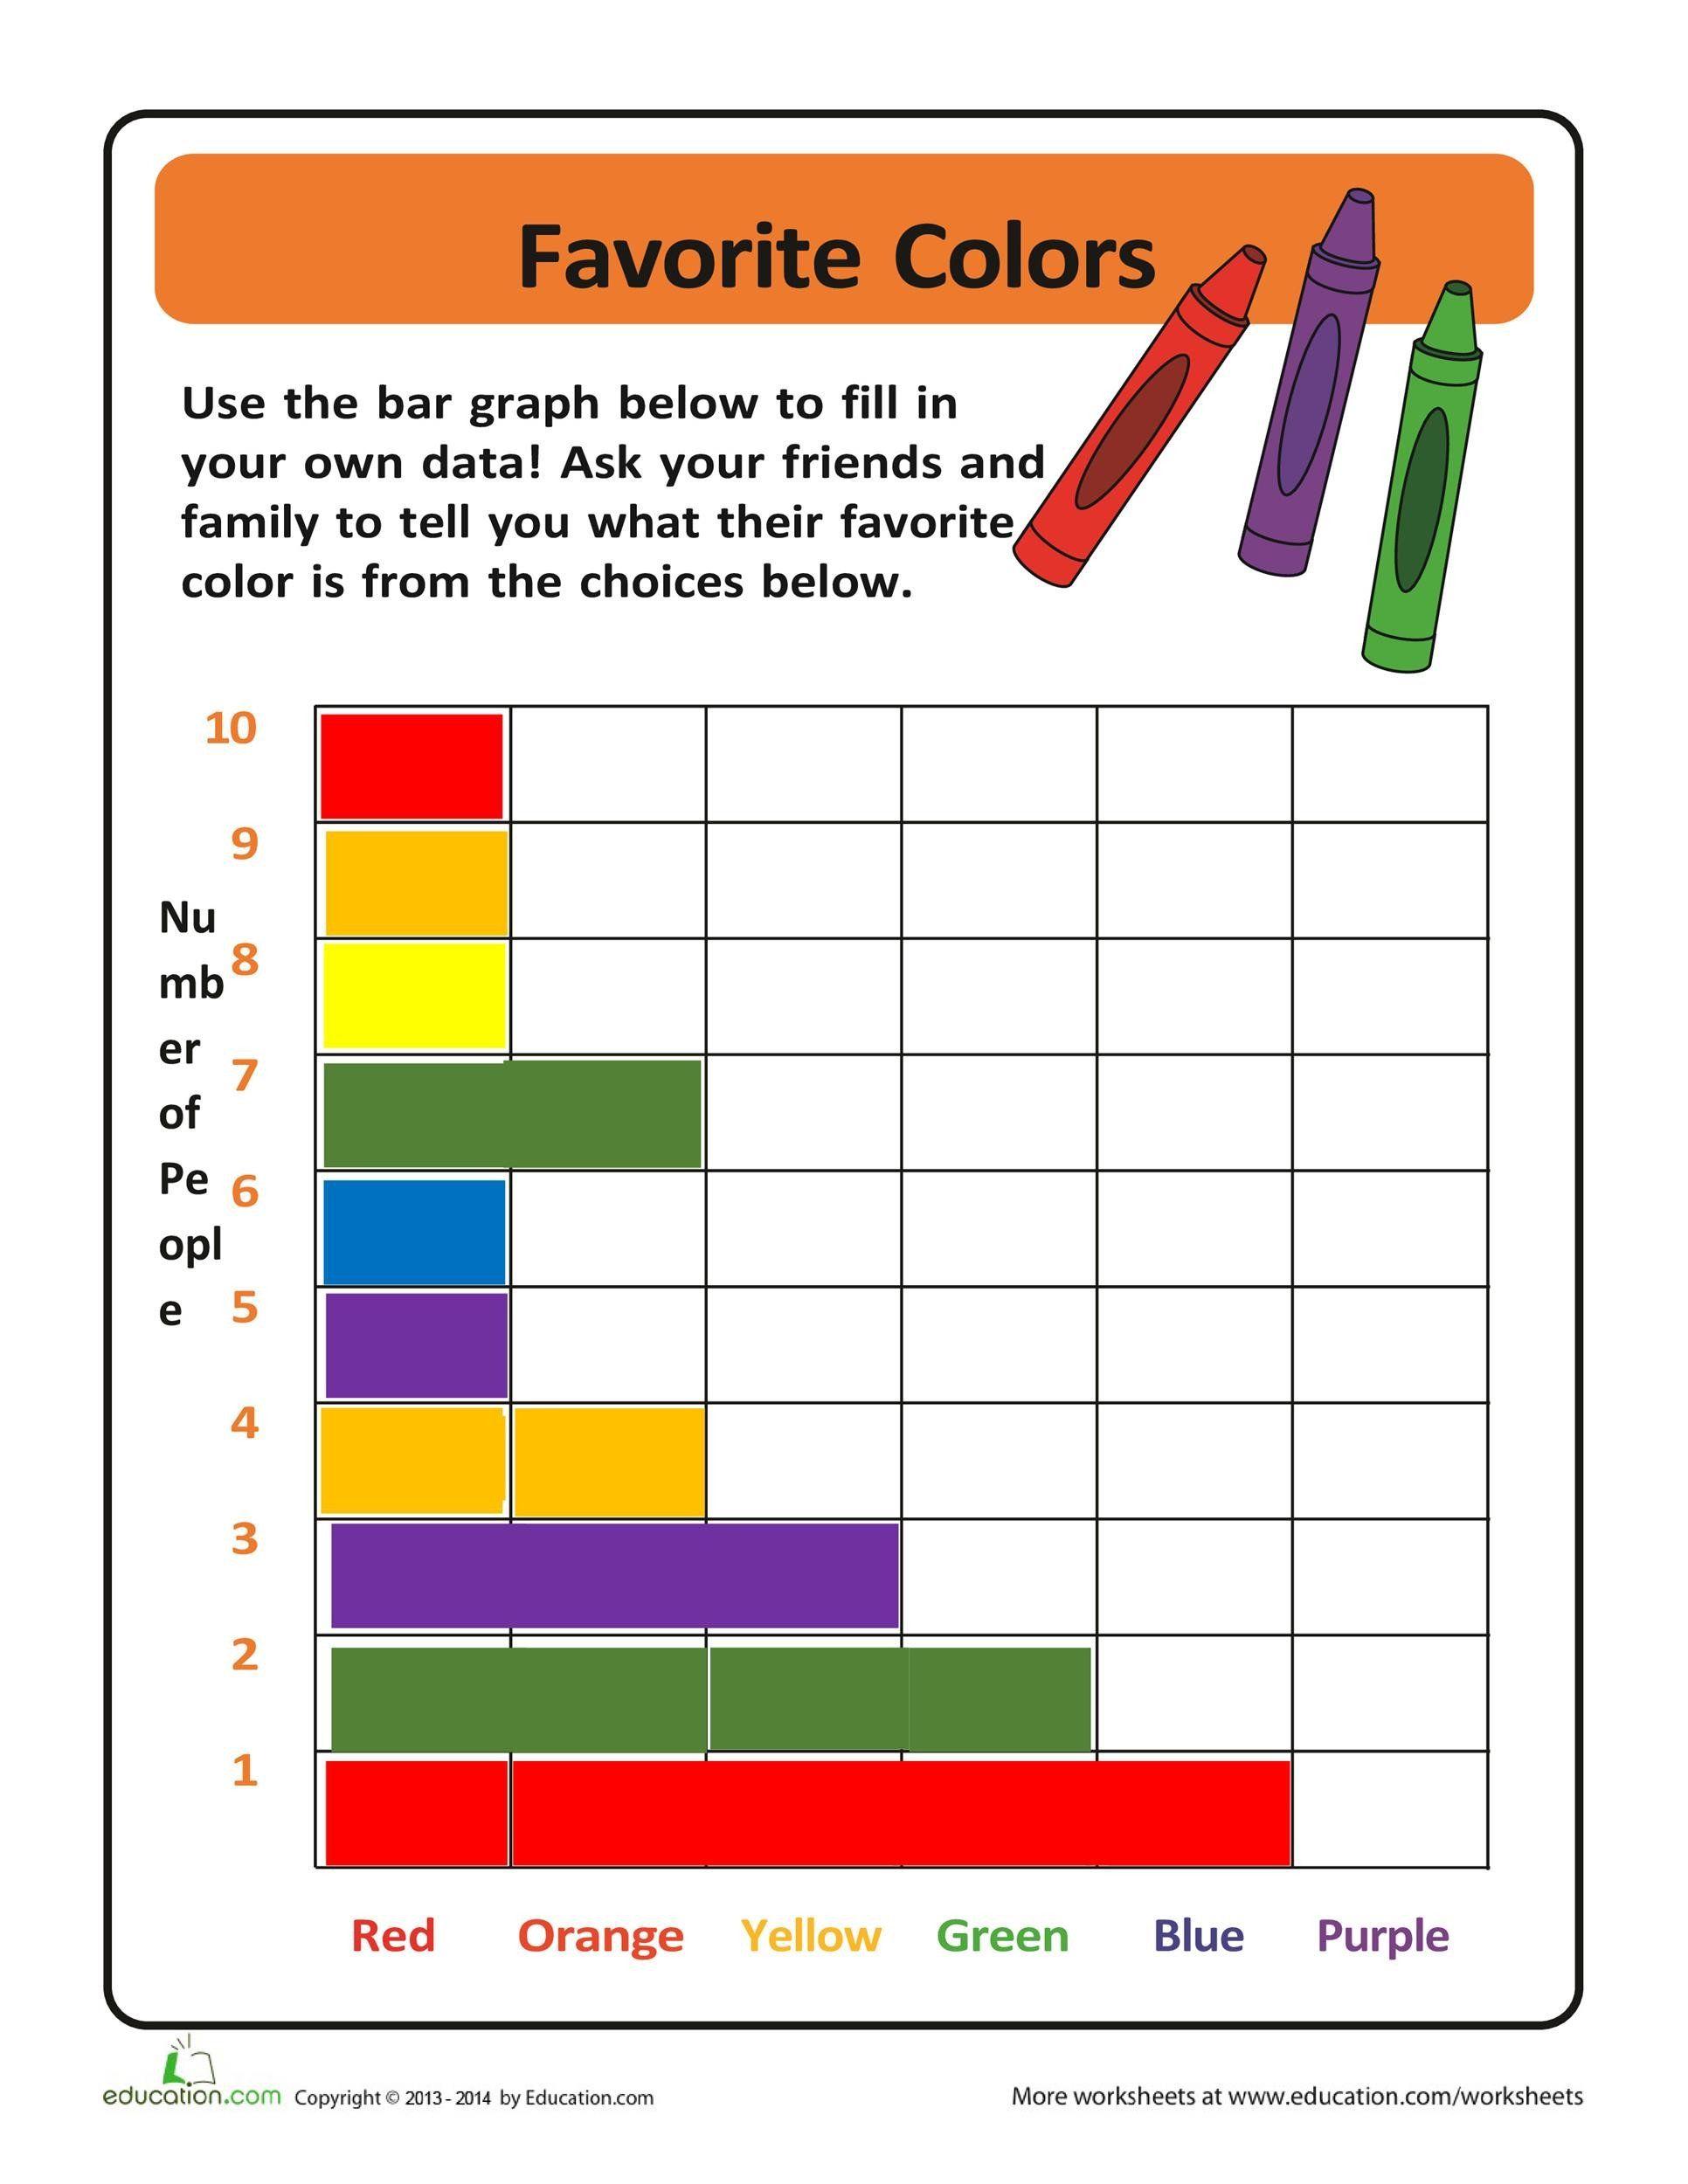 Reading Charts And Graphs Worksheet Printable Charts And Graphs Trinity Bar Graphs Bar Graph Template Kindergarten Worksheets Printable [ 2500 x 1932 Pixel ]